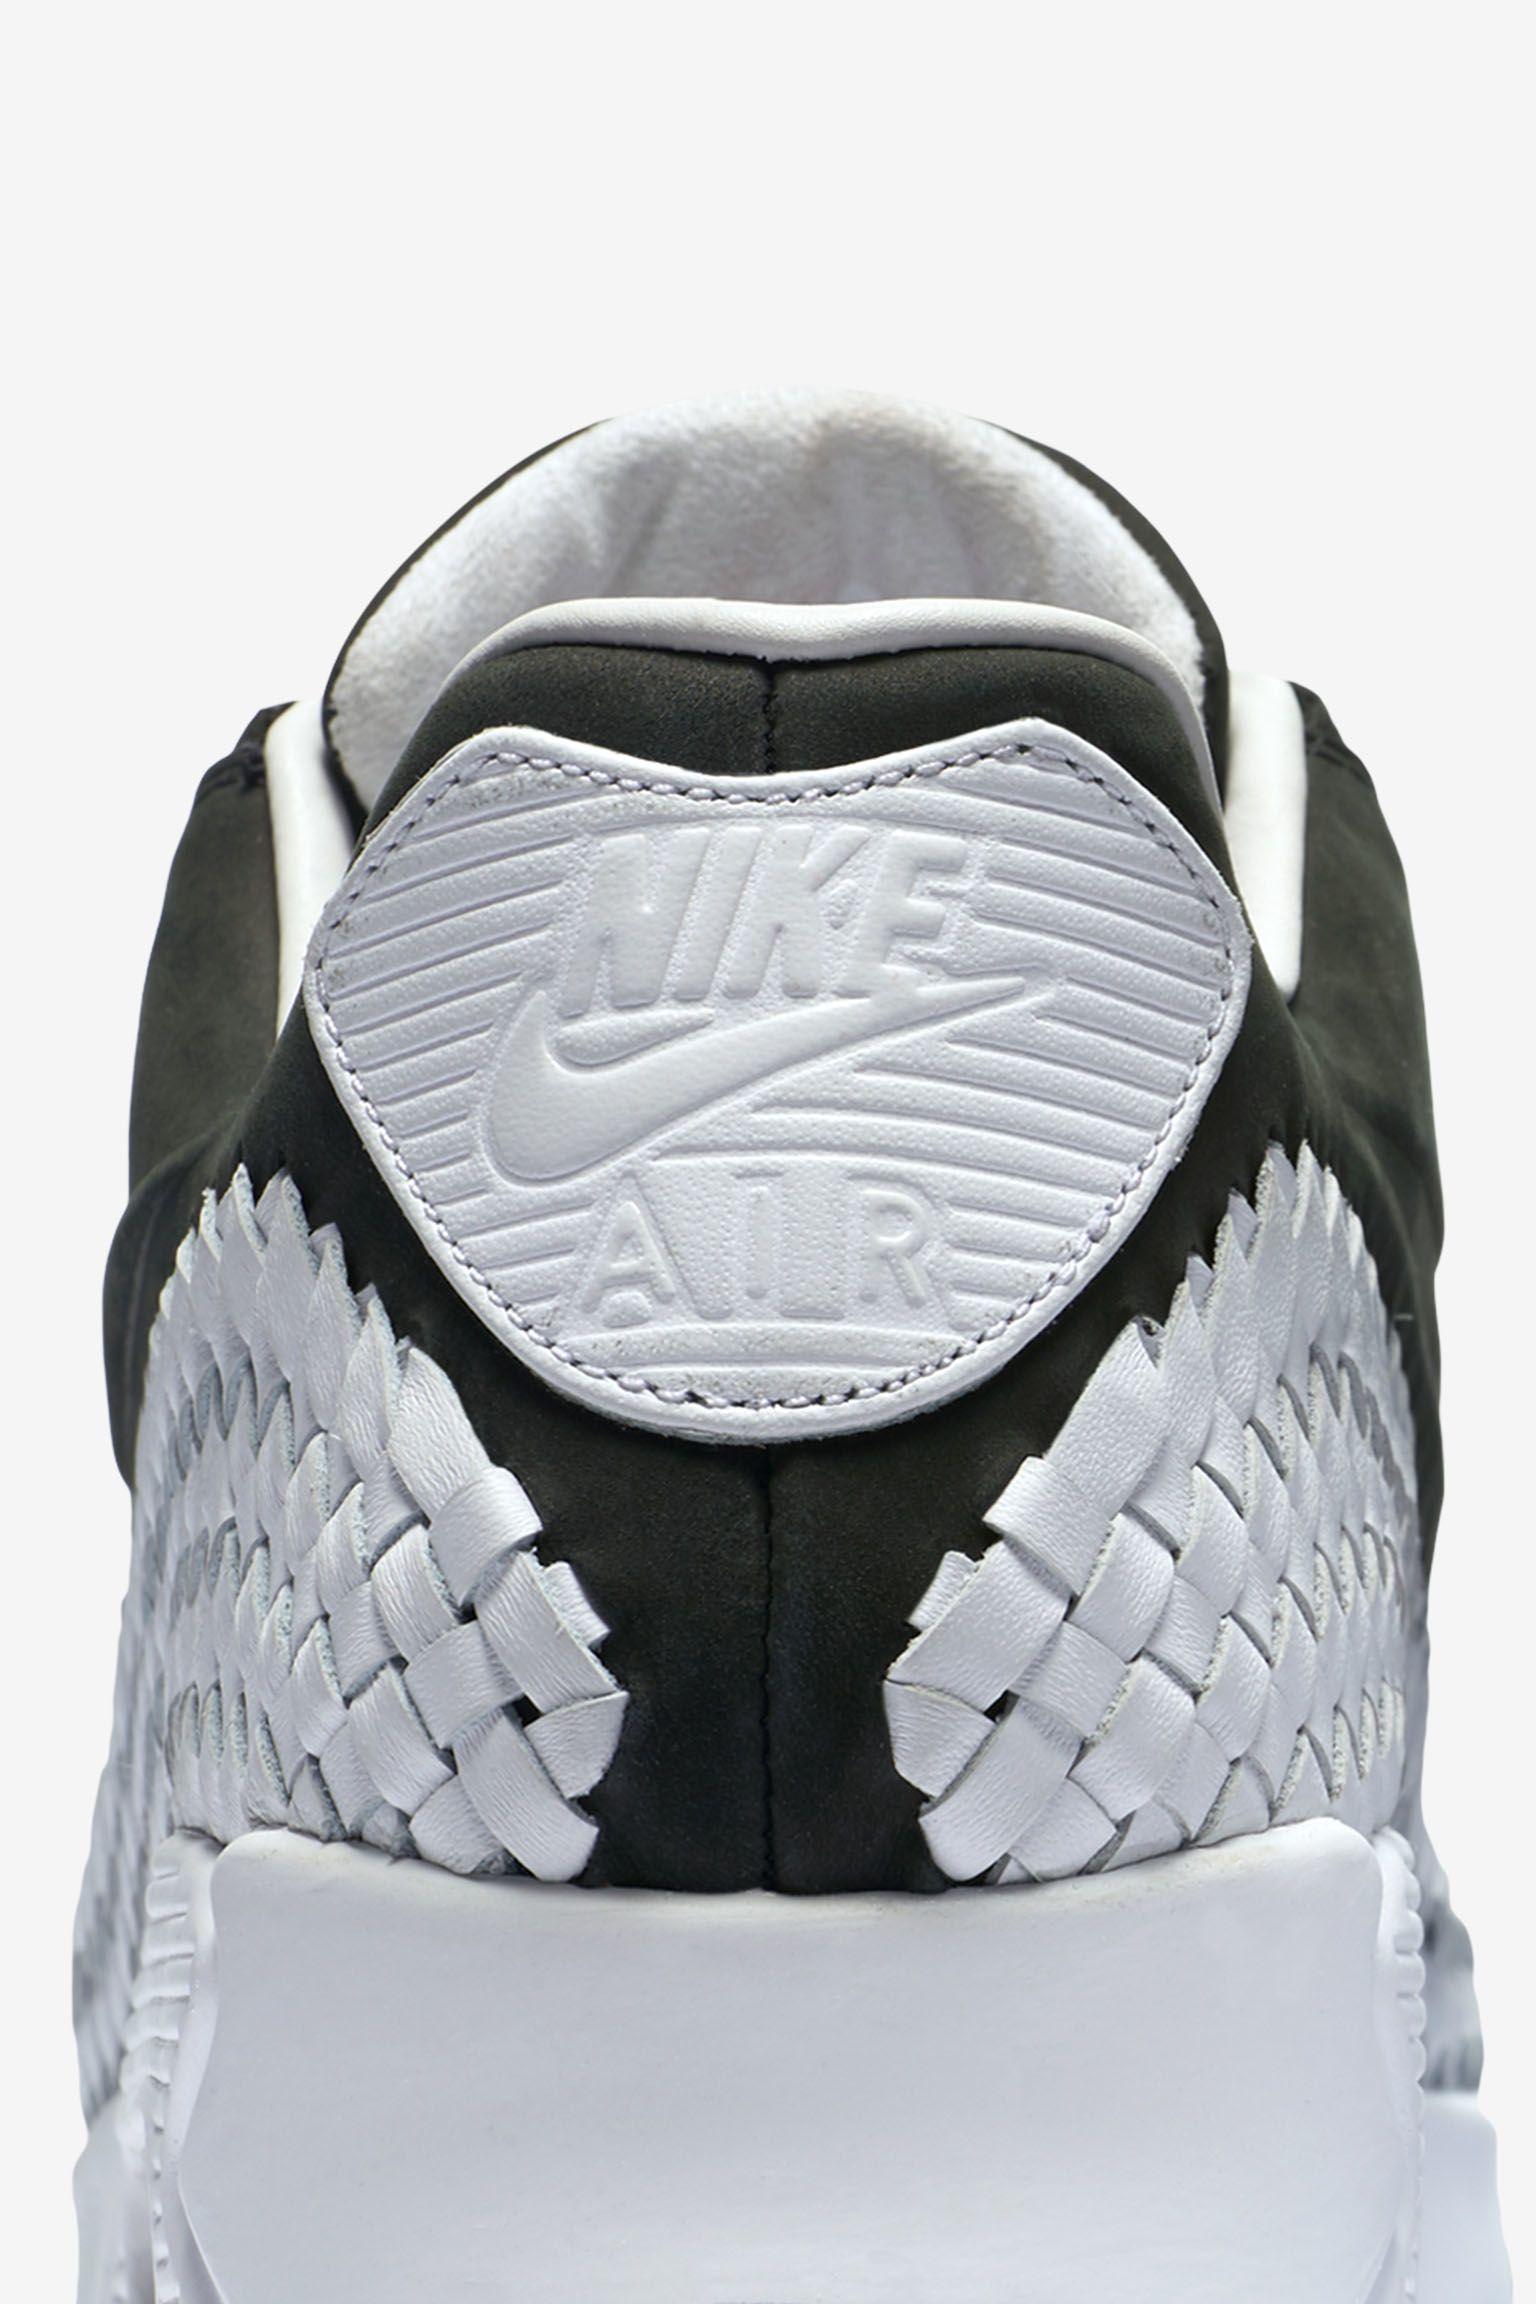 Nike Air Max 90 Woven Premium 'Black & White'